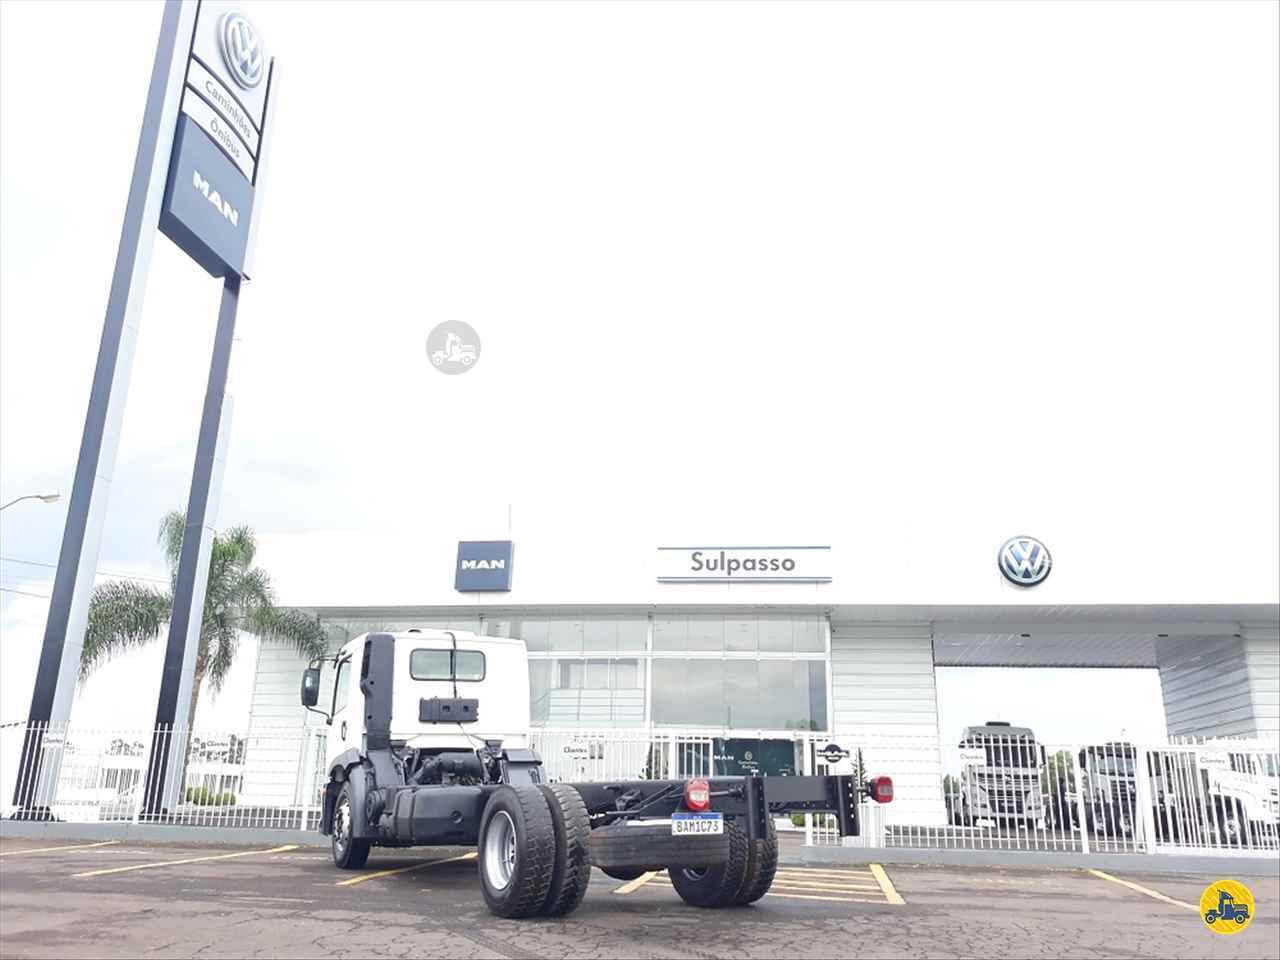 VOLKSWAGEN VW 17280 549457km 2012/2013 Sulpasso Caminhões - VW MAN